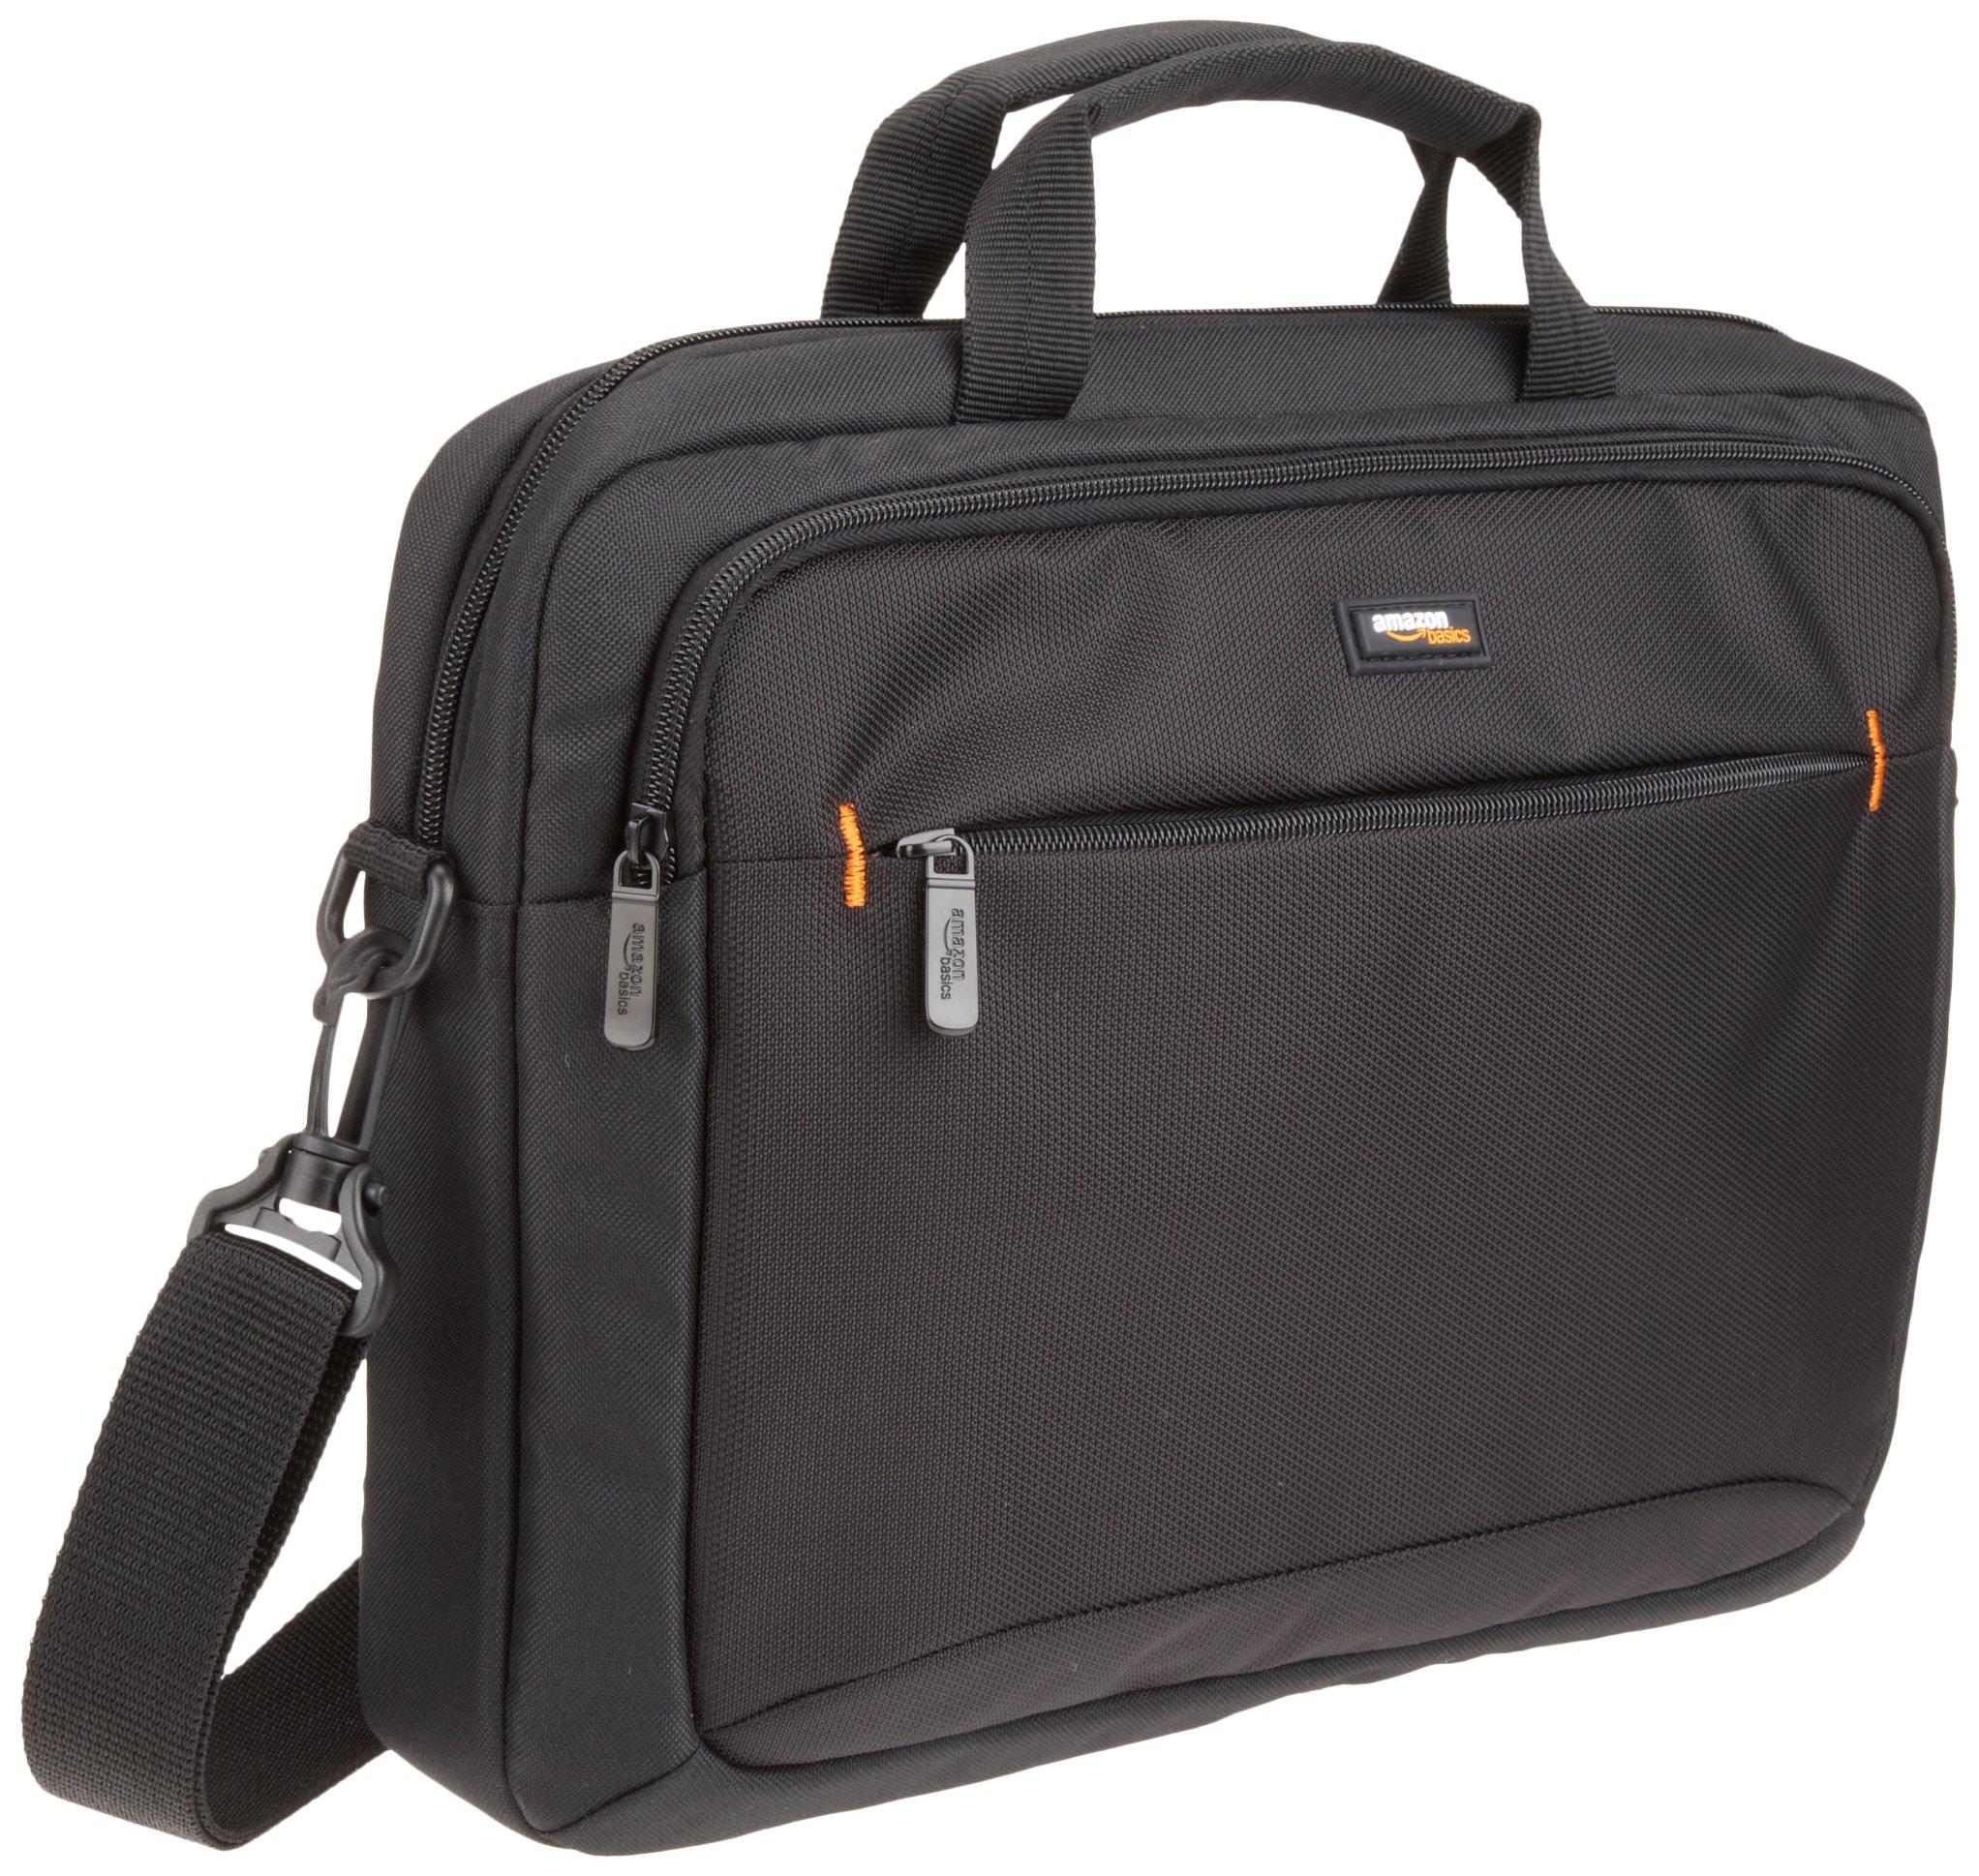 AmazonBasics 14.1 Inch Laptop and Tablet Case , 24-Pack by AmazonBasics